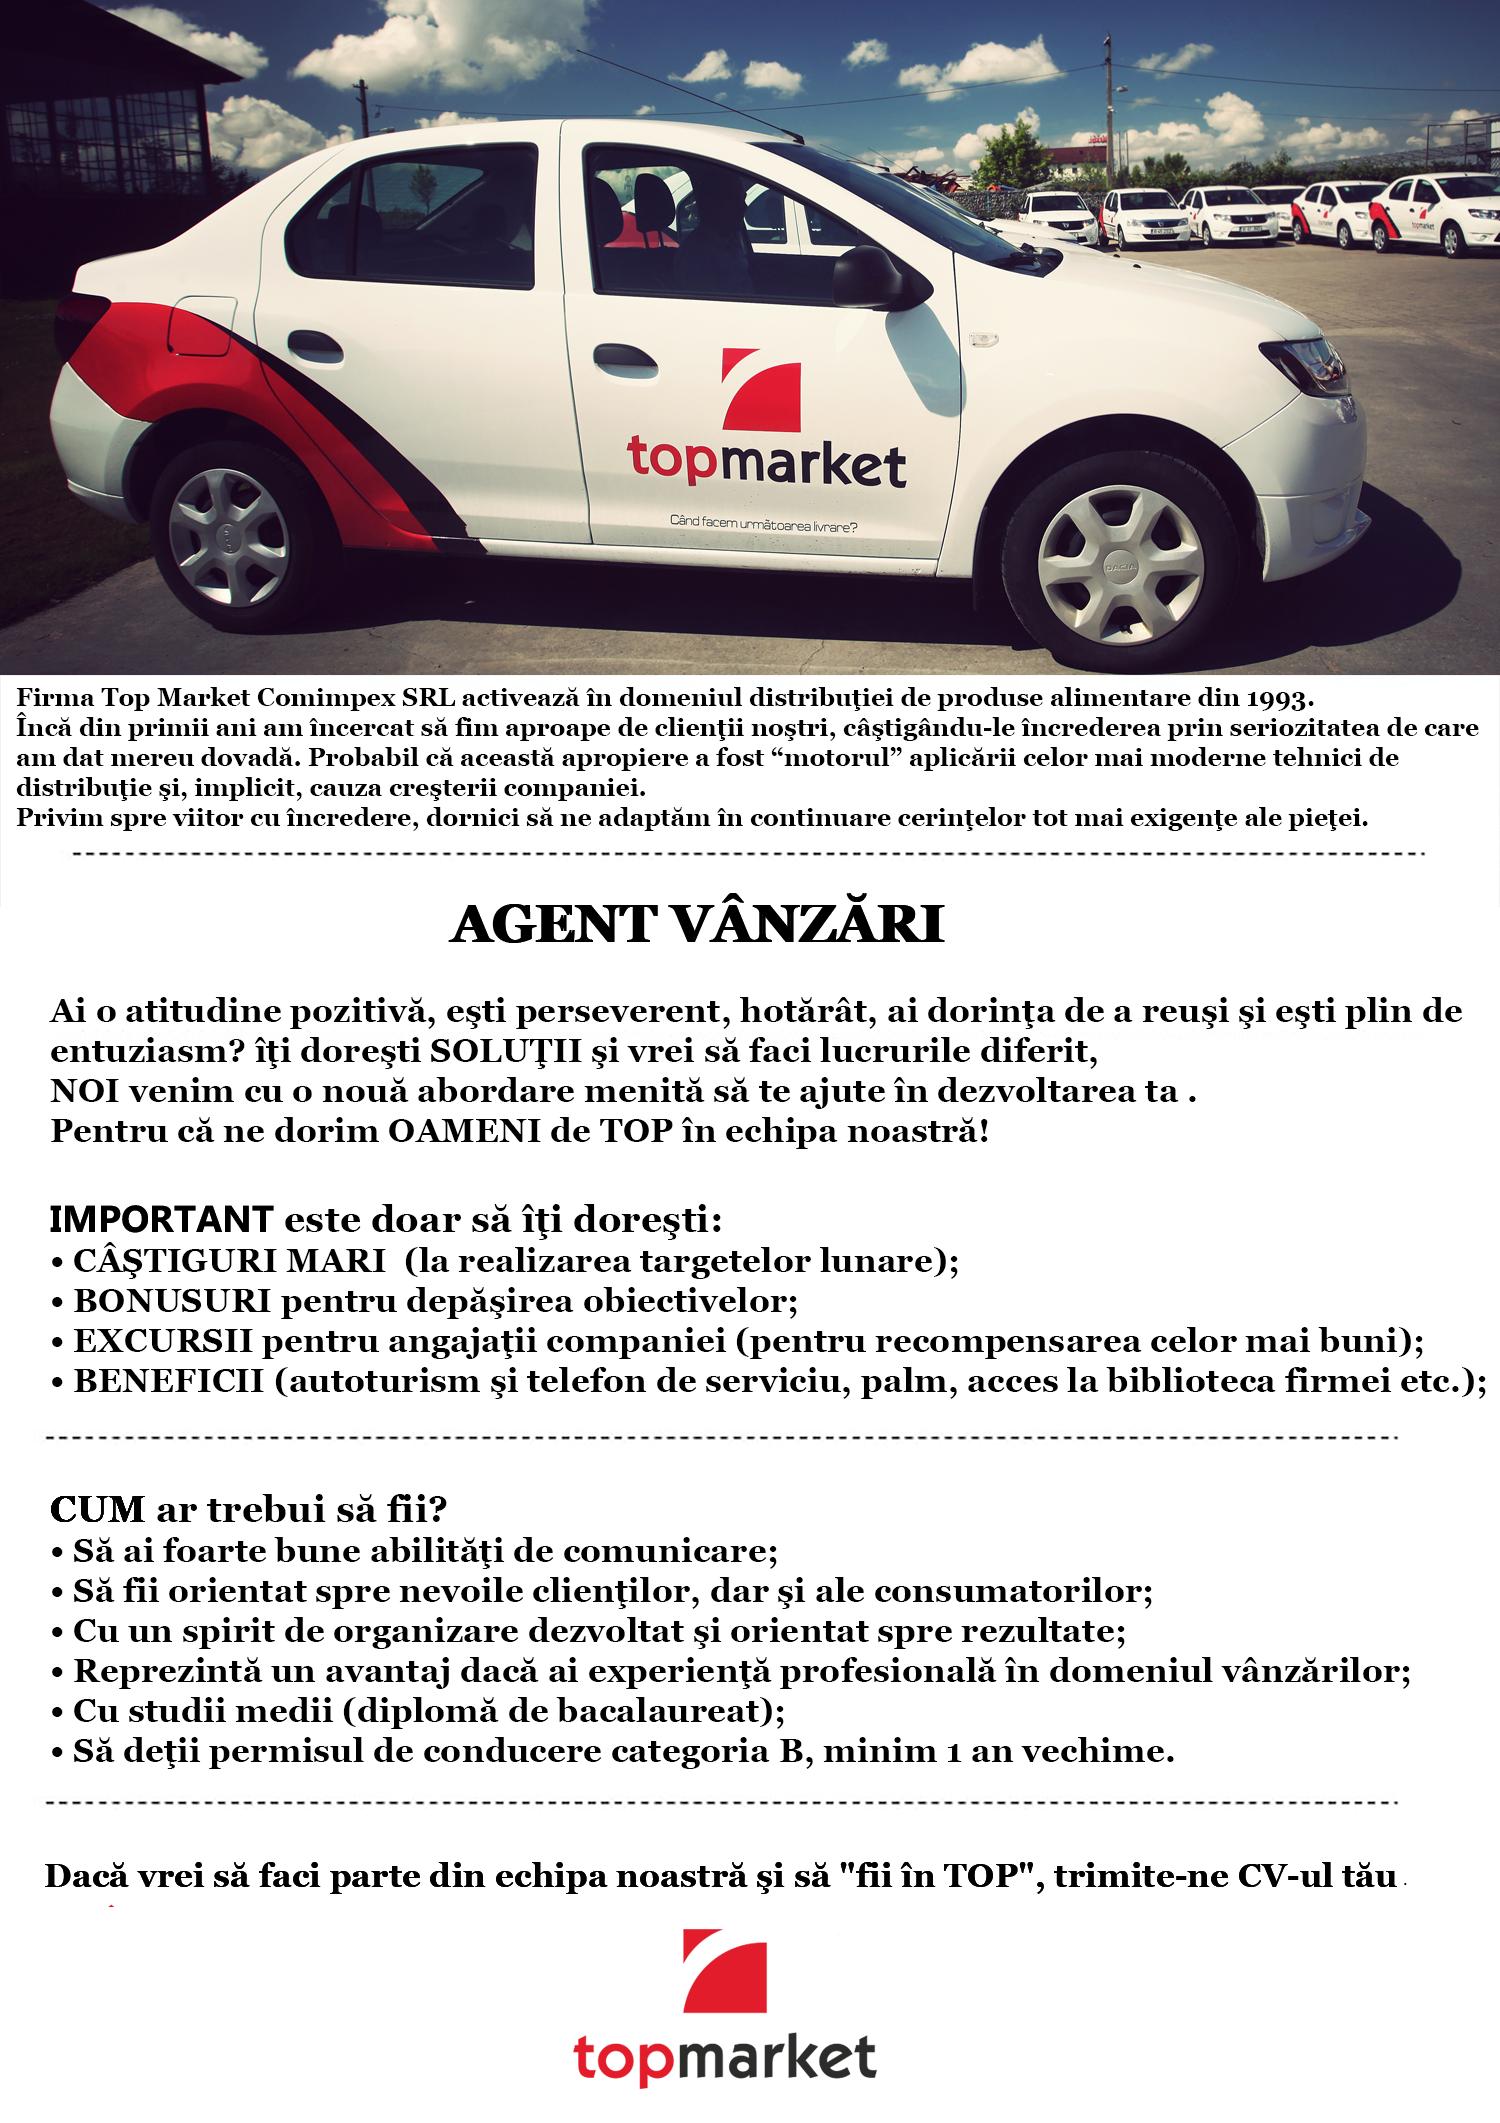 Agent Vanzari 2